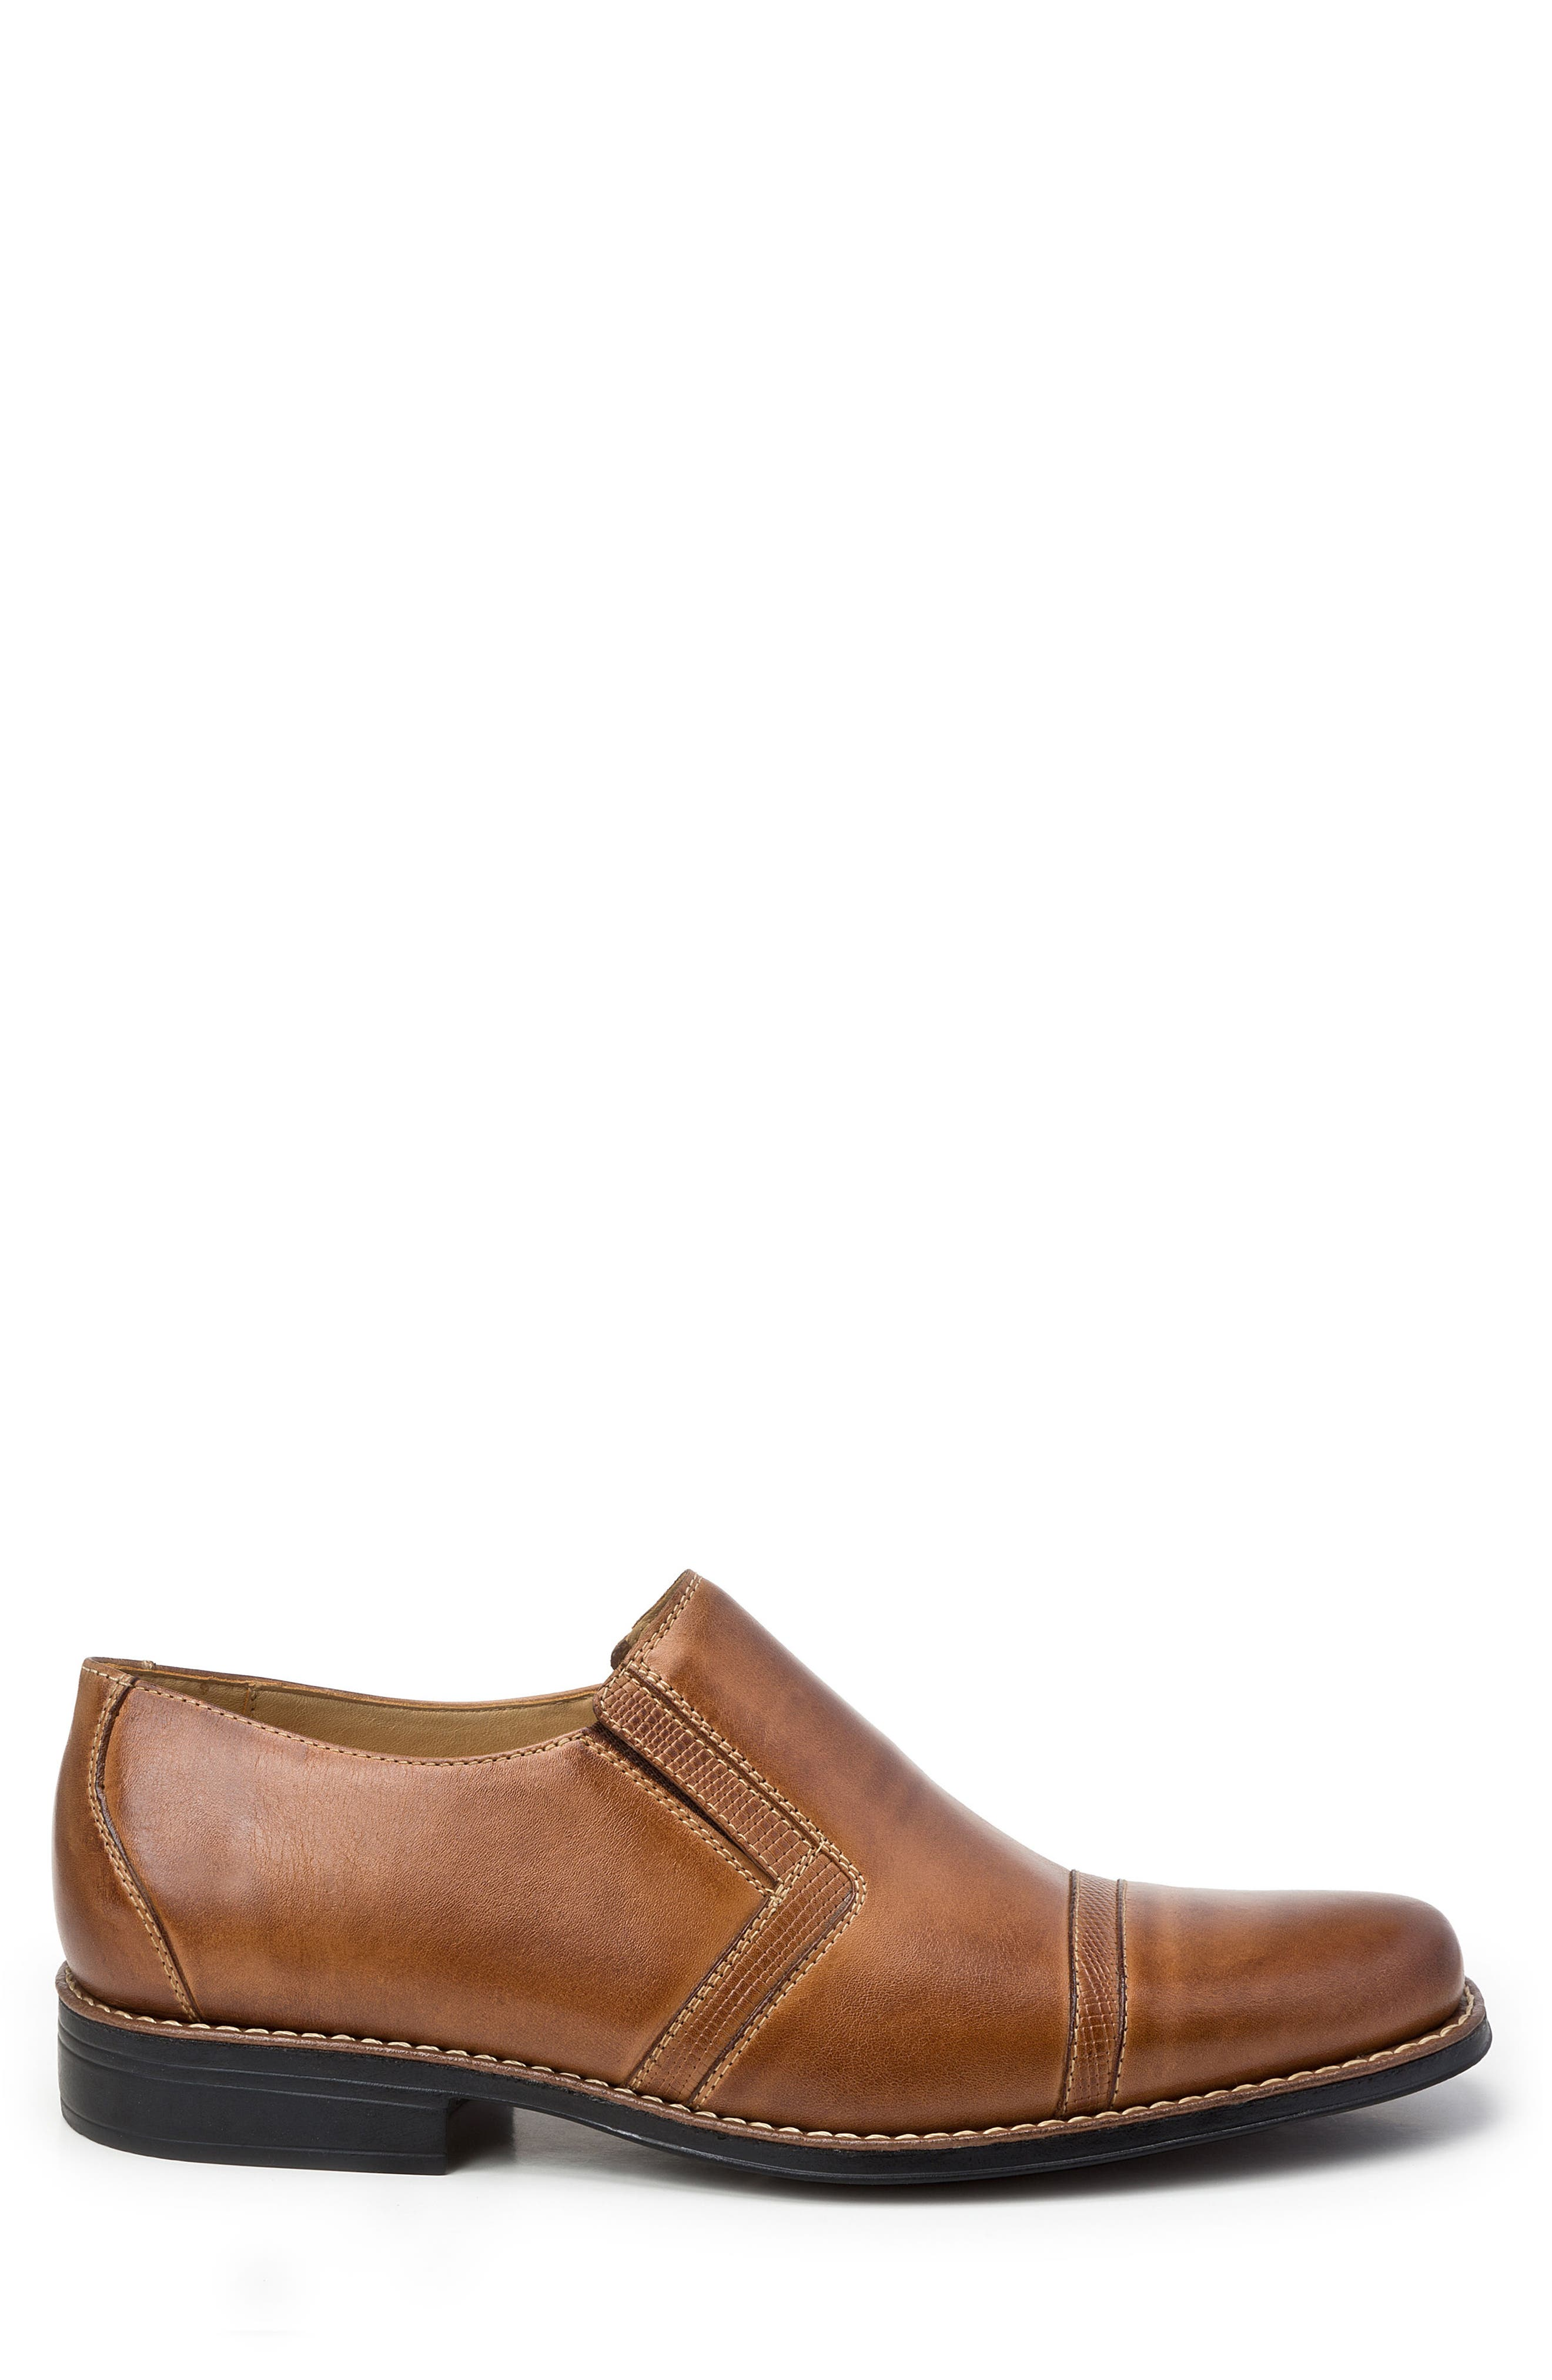 Sebastian Venetian Loafer,                             Alternate thumbnail 3, color,                             Tan Leather